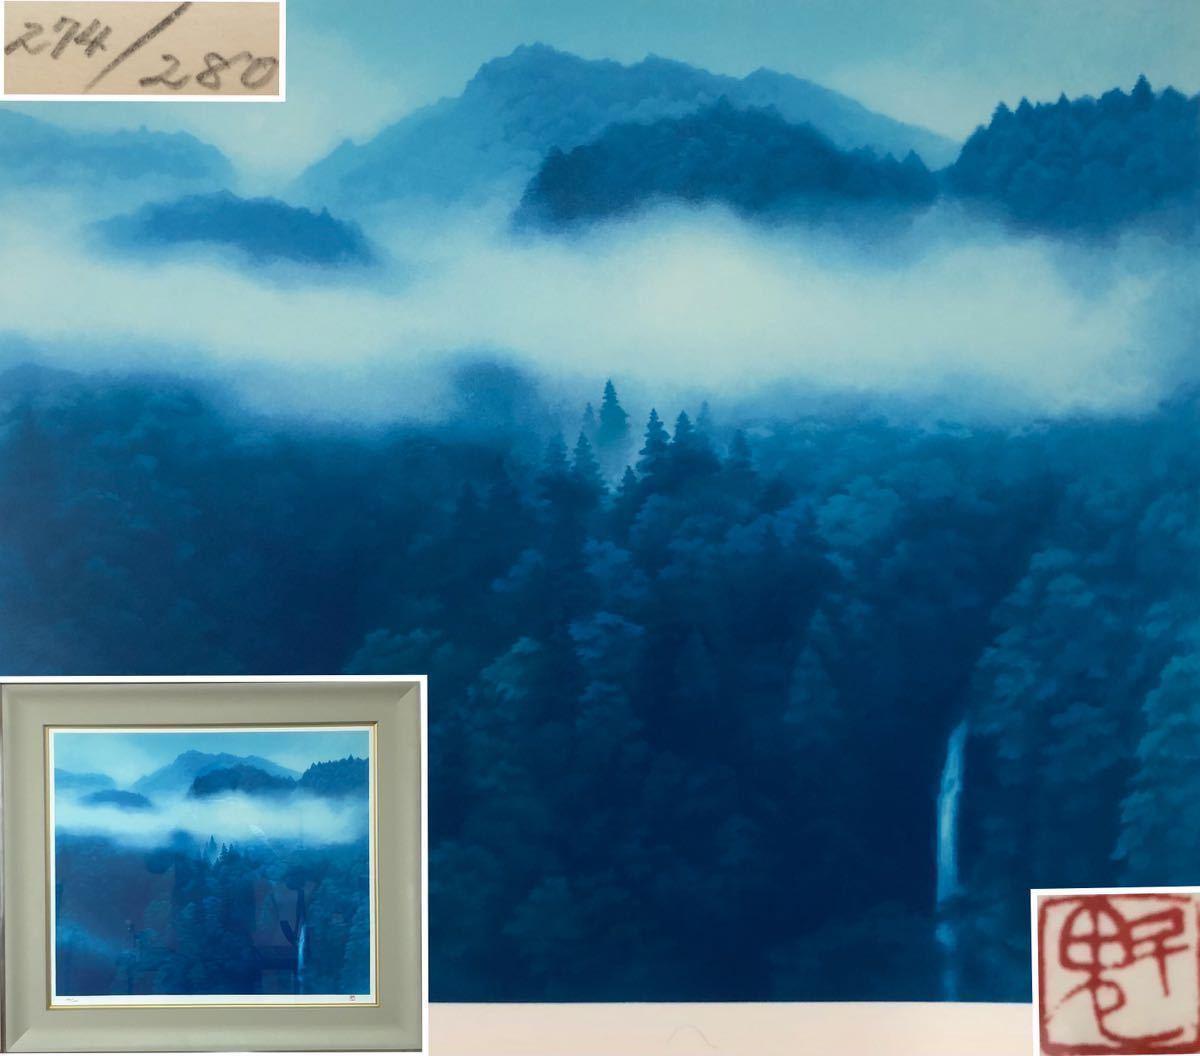 D-424 東山魁夷「青い谷」274/280 リトグラフ 黄袋 タトウ箱 風景画 日本画 森工房 文化勲章 文化功労者 日本芸術院会員 物故巨匠 初だし品